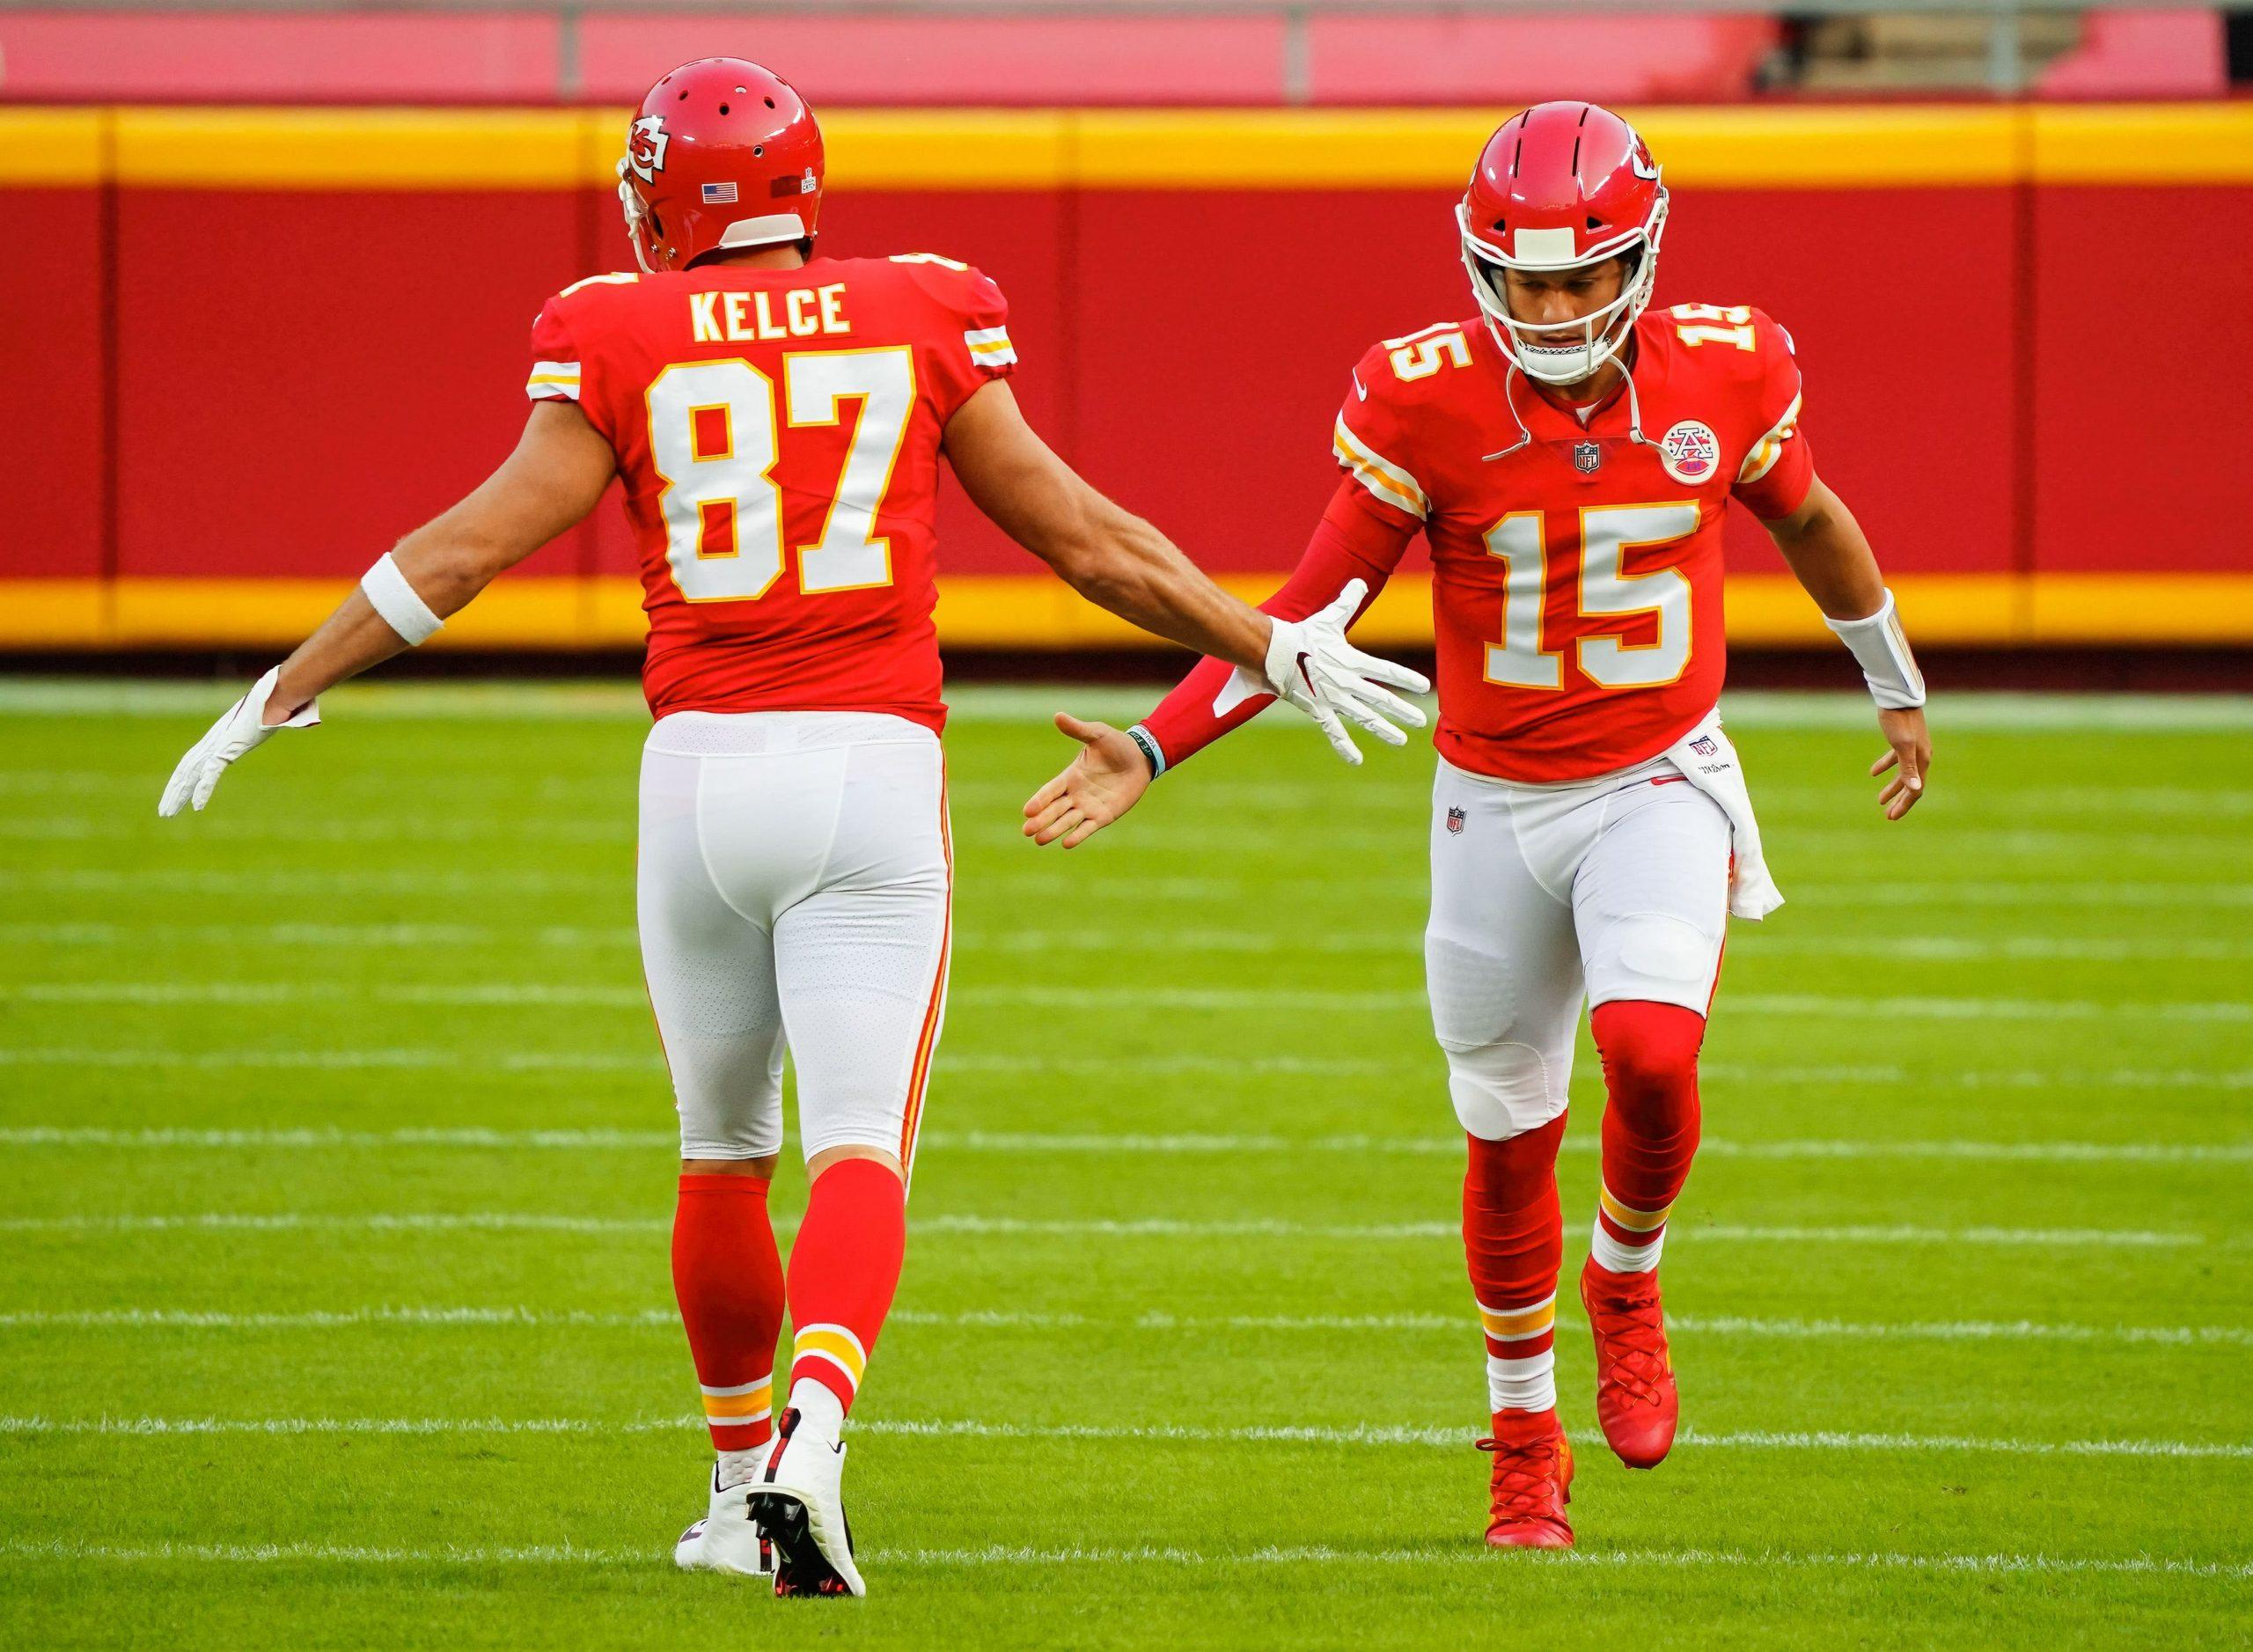 Travis Kelce and Patrick Mahomes of the Kansas City Chiefs